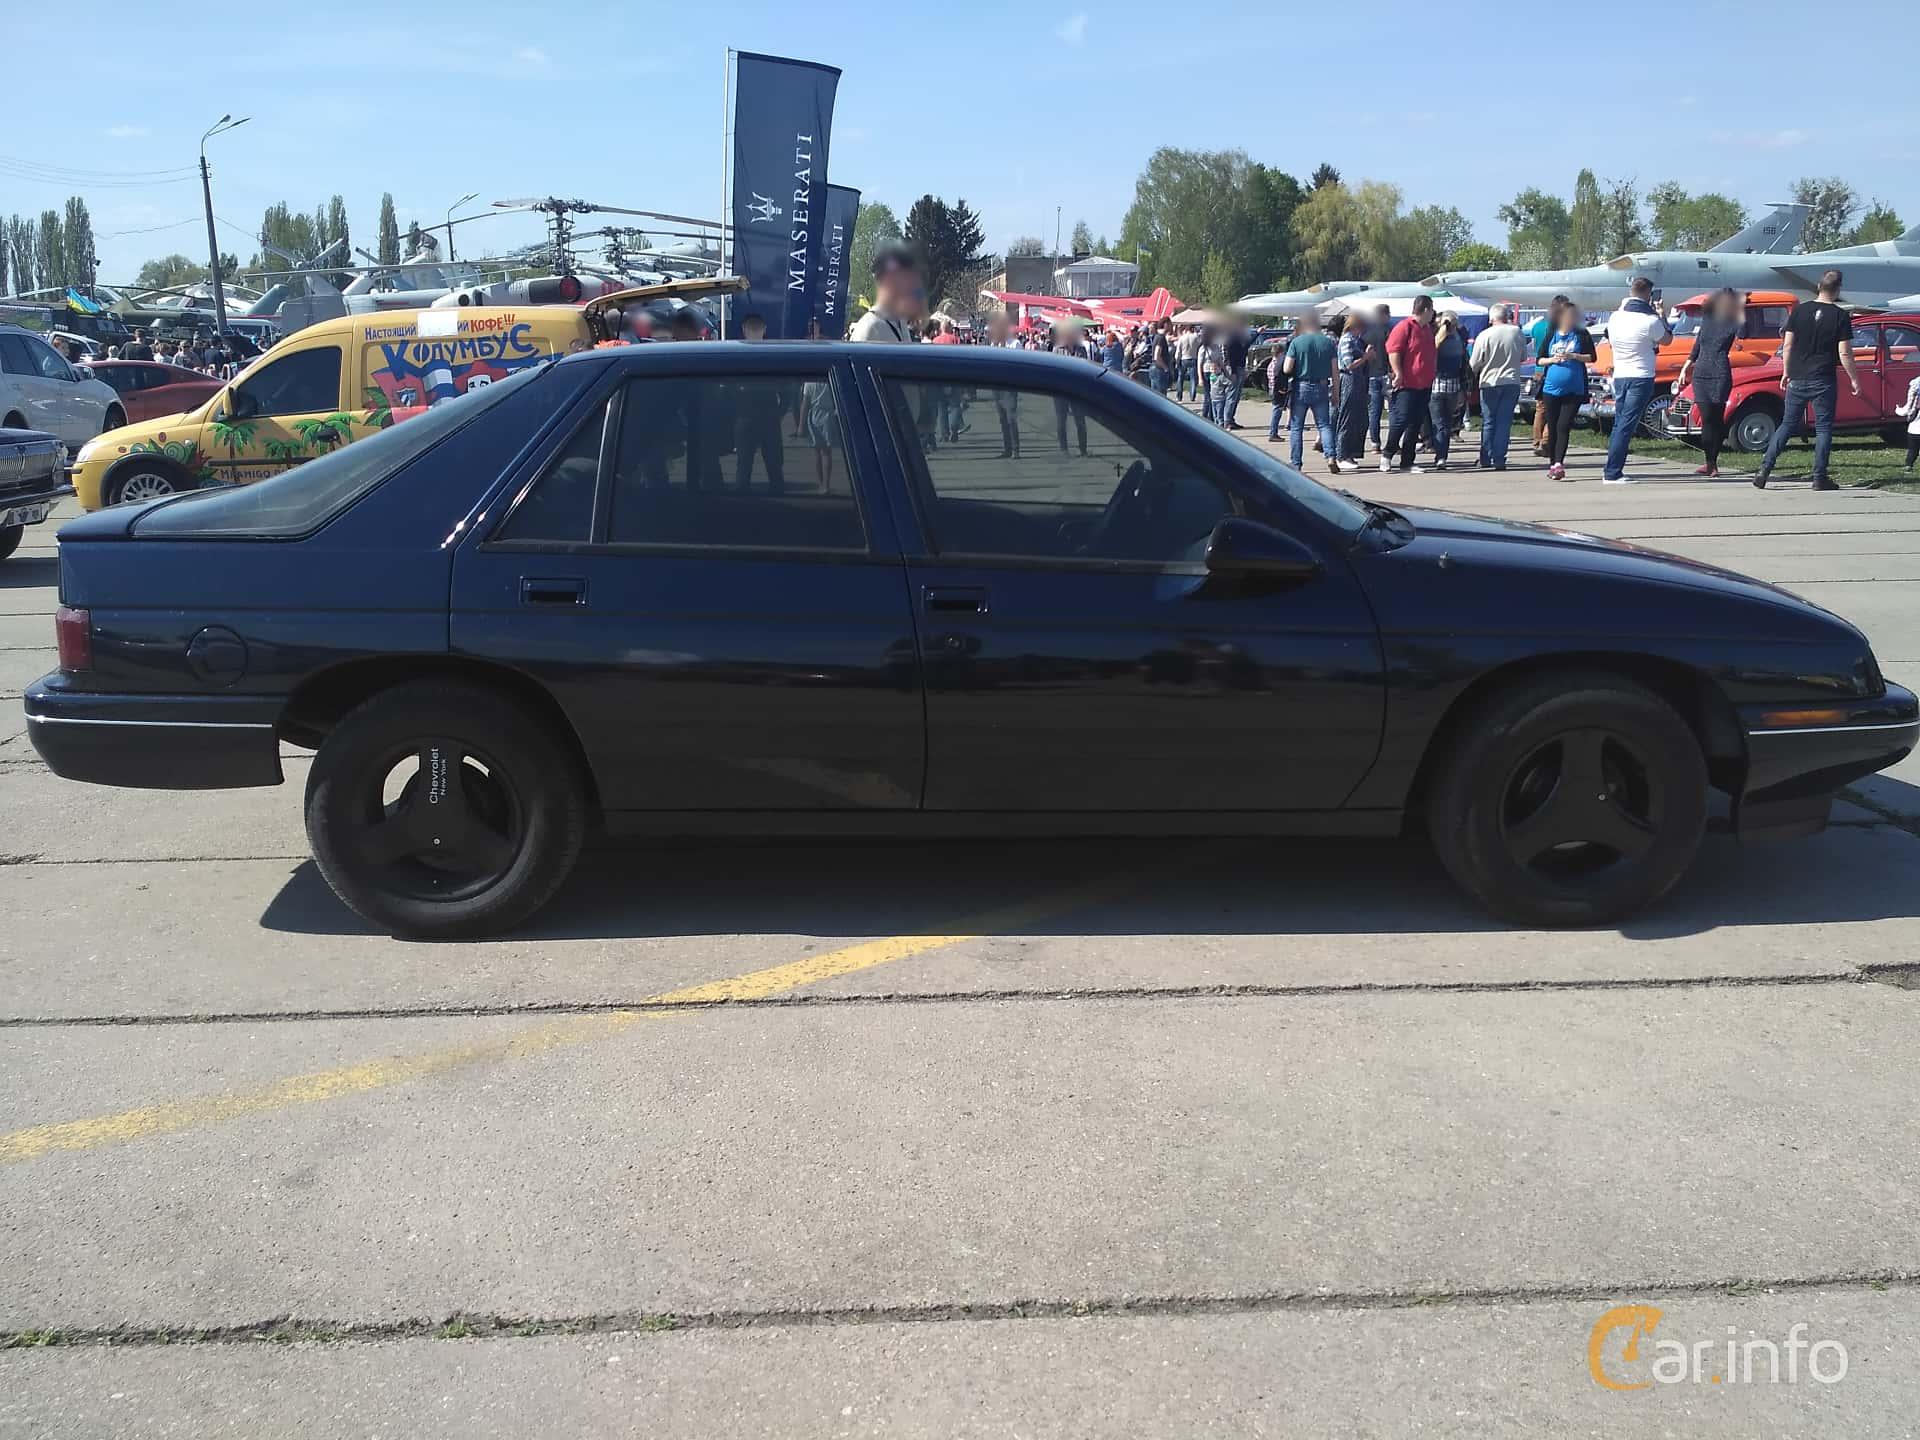 Chevrolet Corsica Hatchback 3.1 V6 Automatic, 142hp, 1991